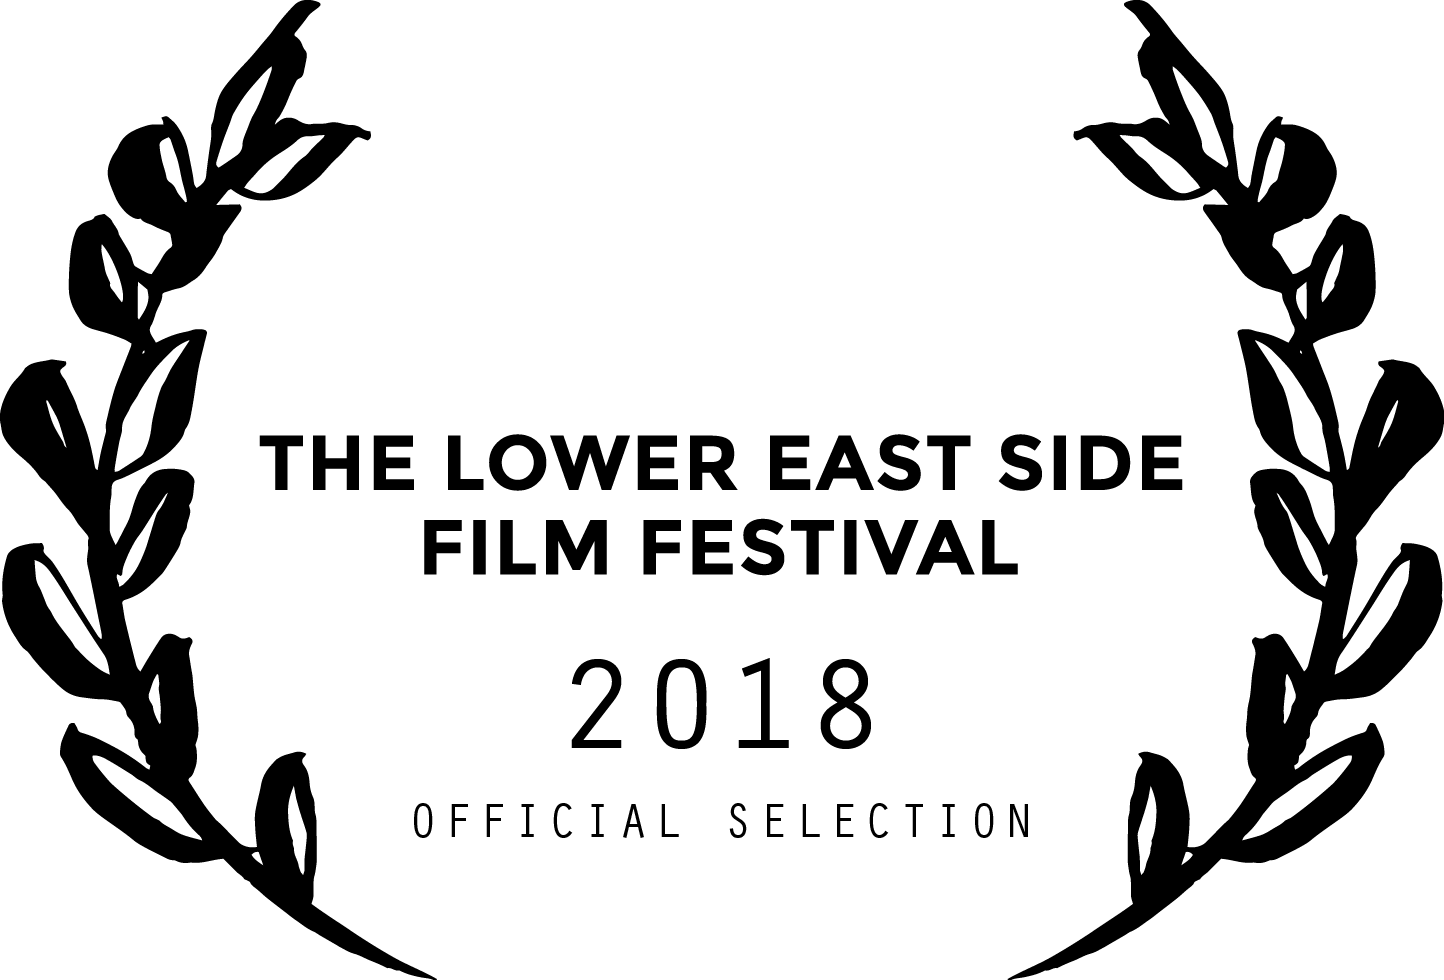 LESFF_2018_Official_Selection_Laurels.png